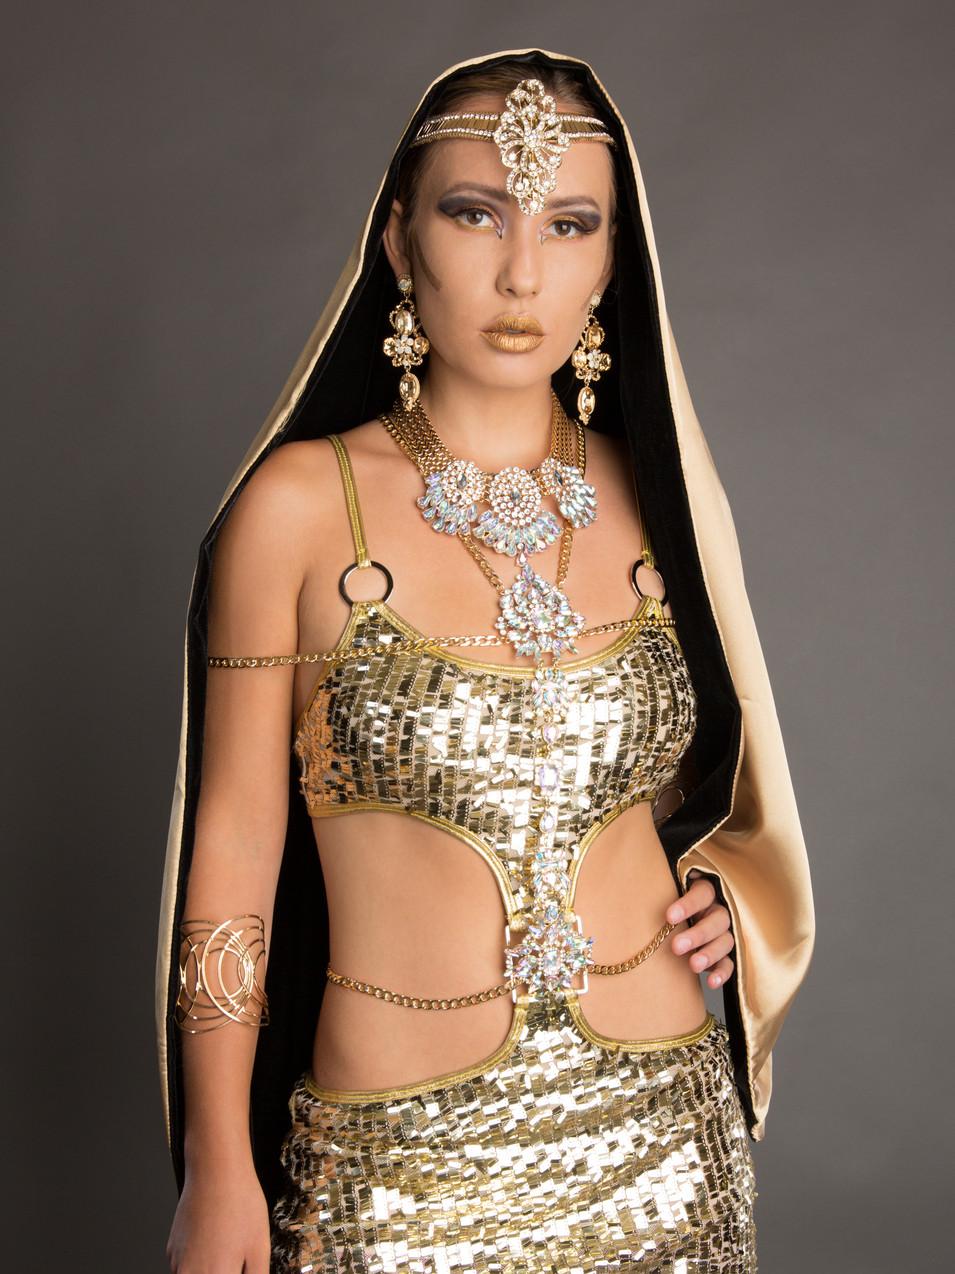 Creative portrait of woman in gold costume - Medford photographer, John Neilson